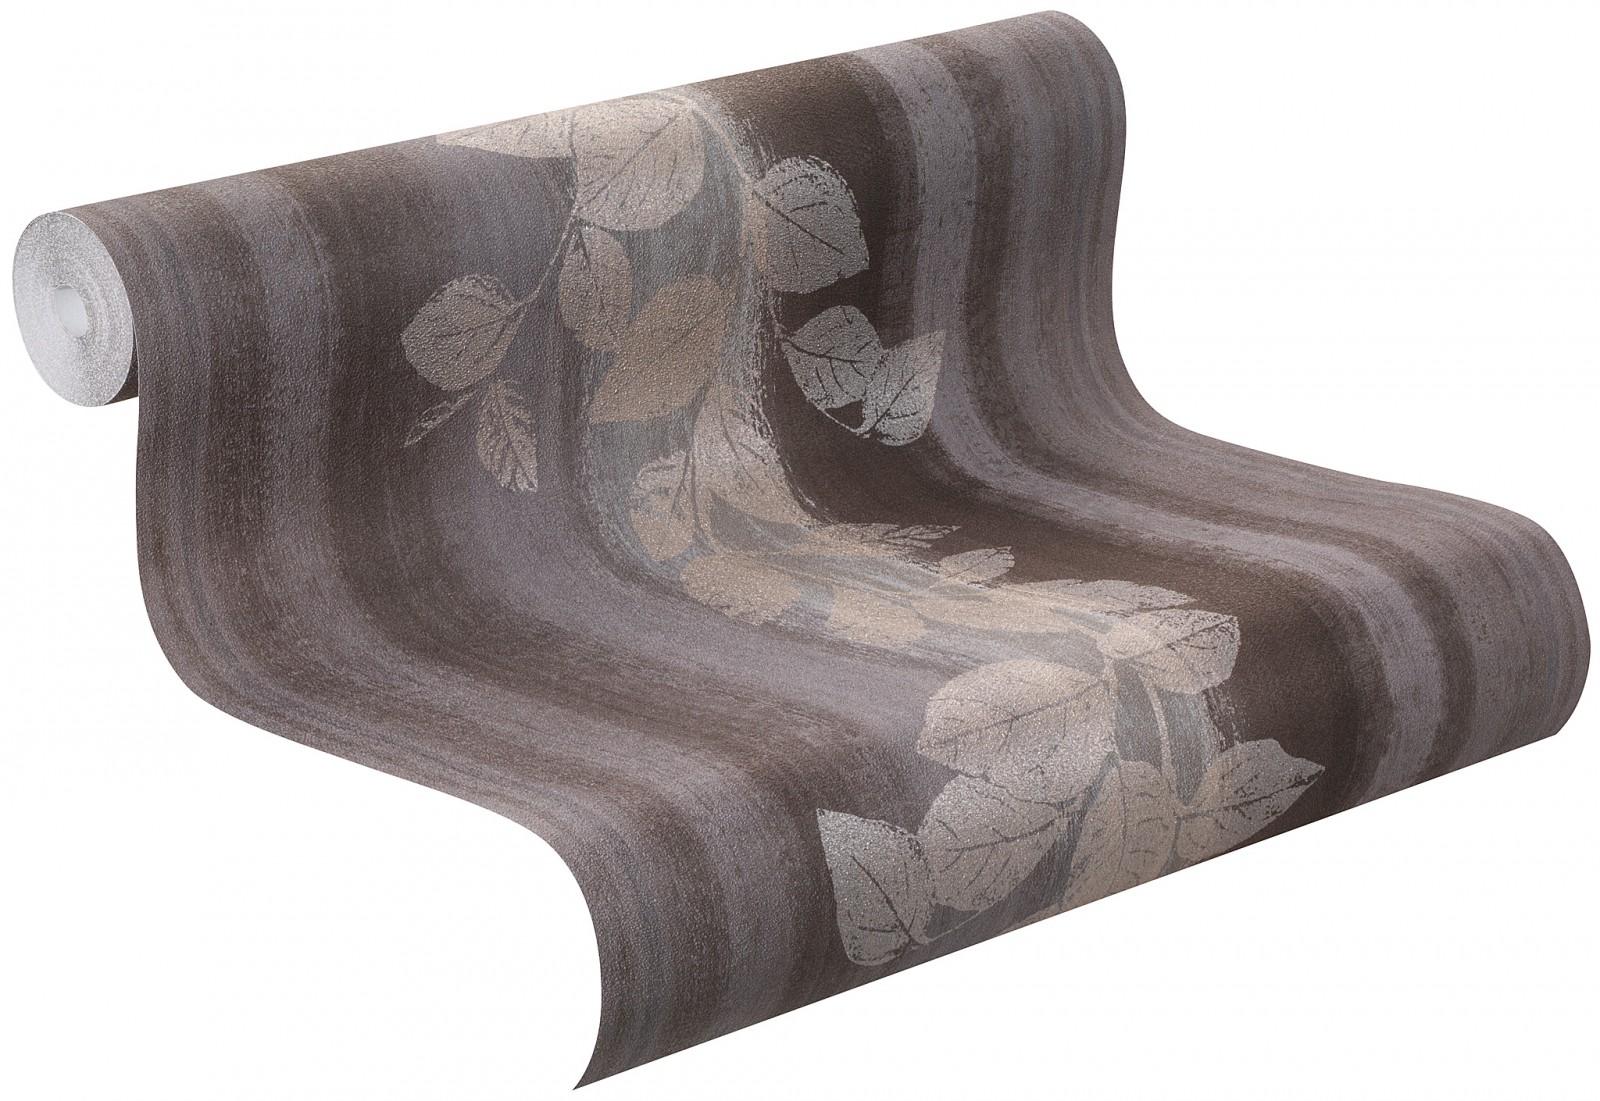 vliestapete blume floral grau braun fiducia tapete rasch. Black Bedroom Furniture Sets. Home Design Ideas